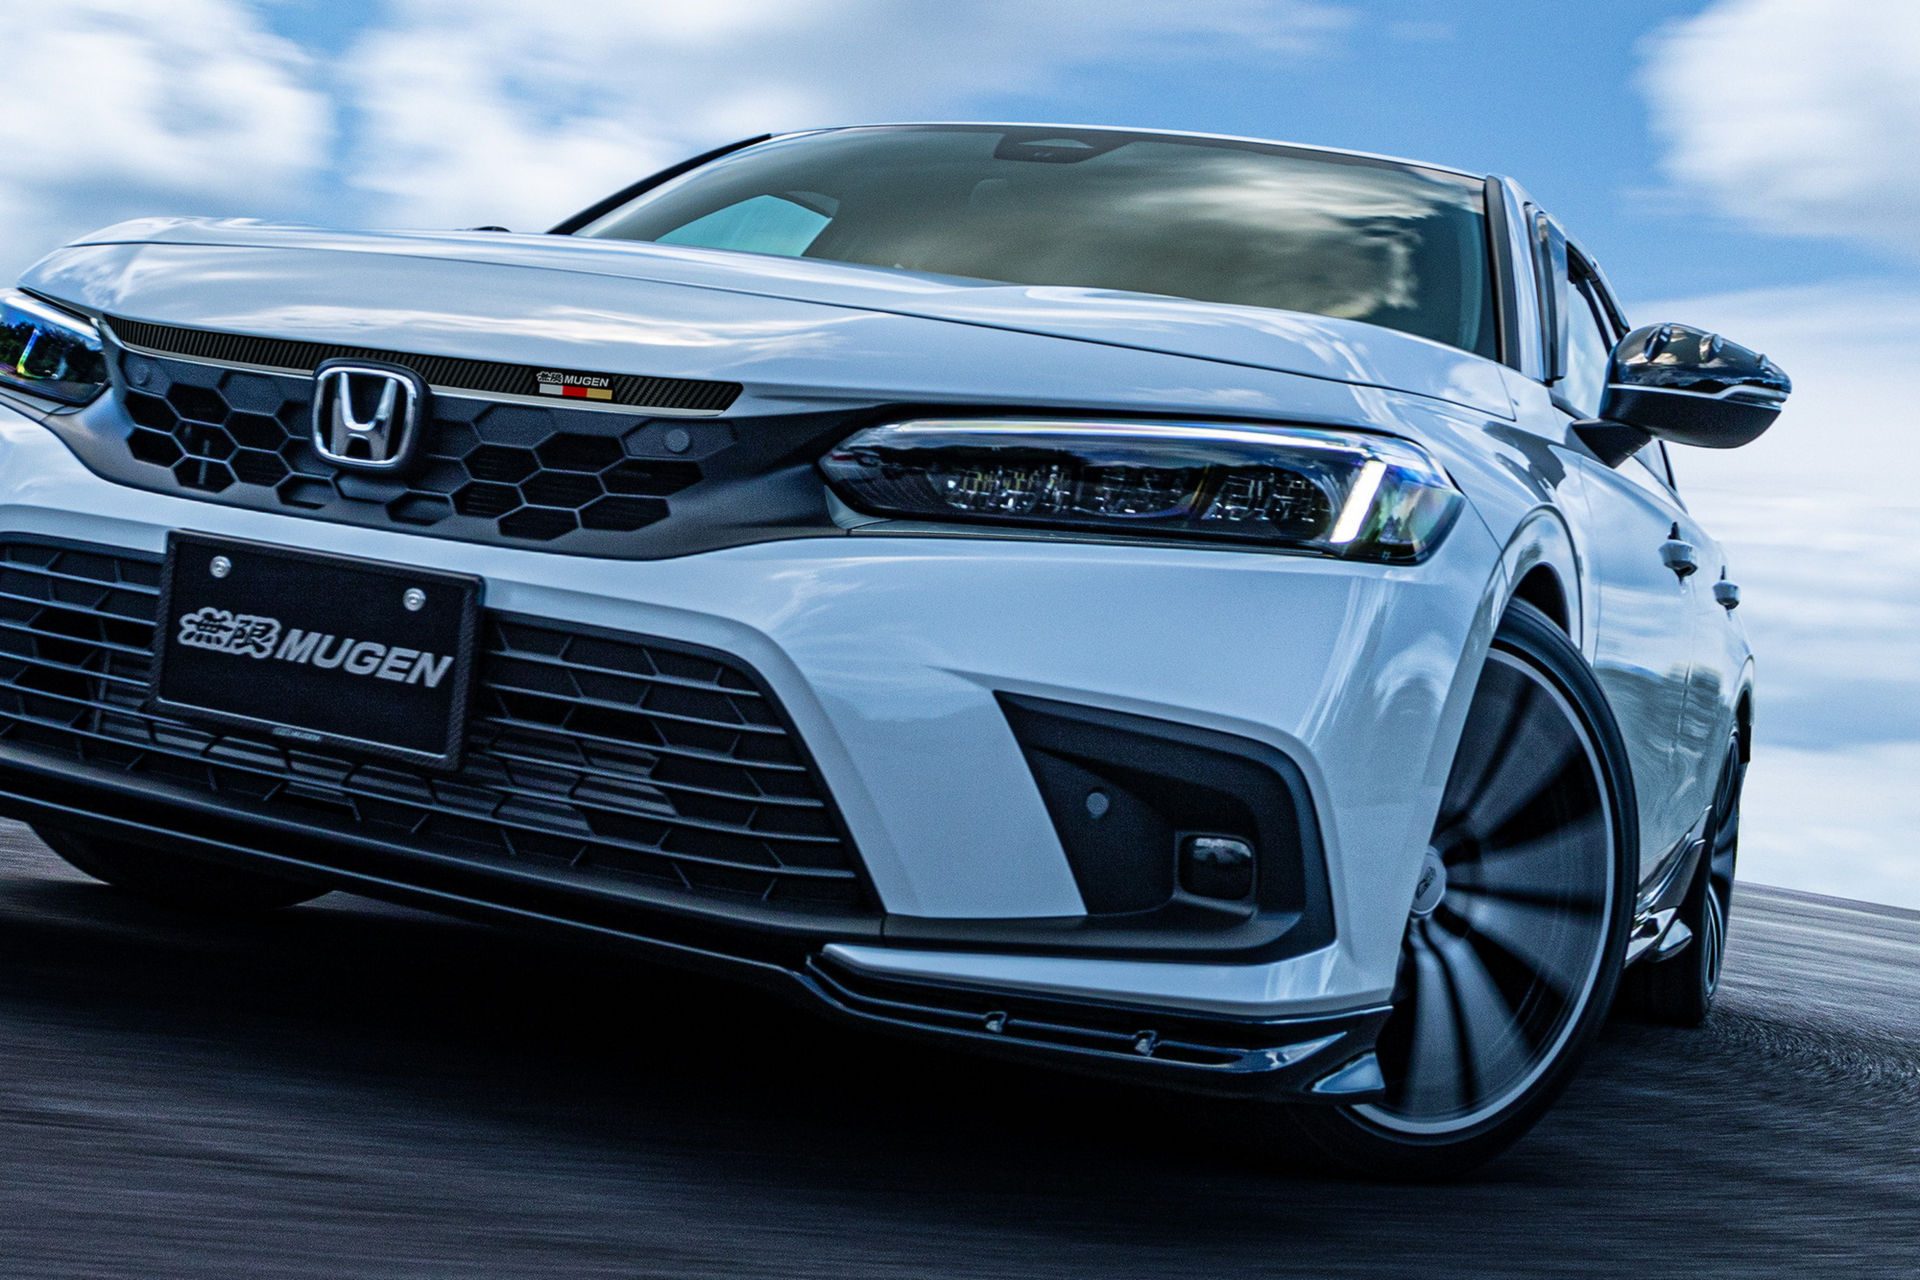 Honda-Civic-2021-Mugen-3